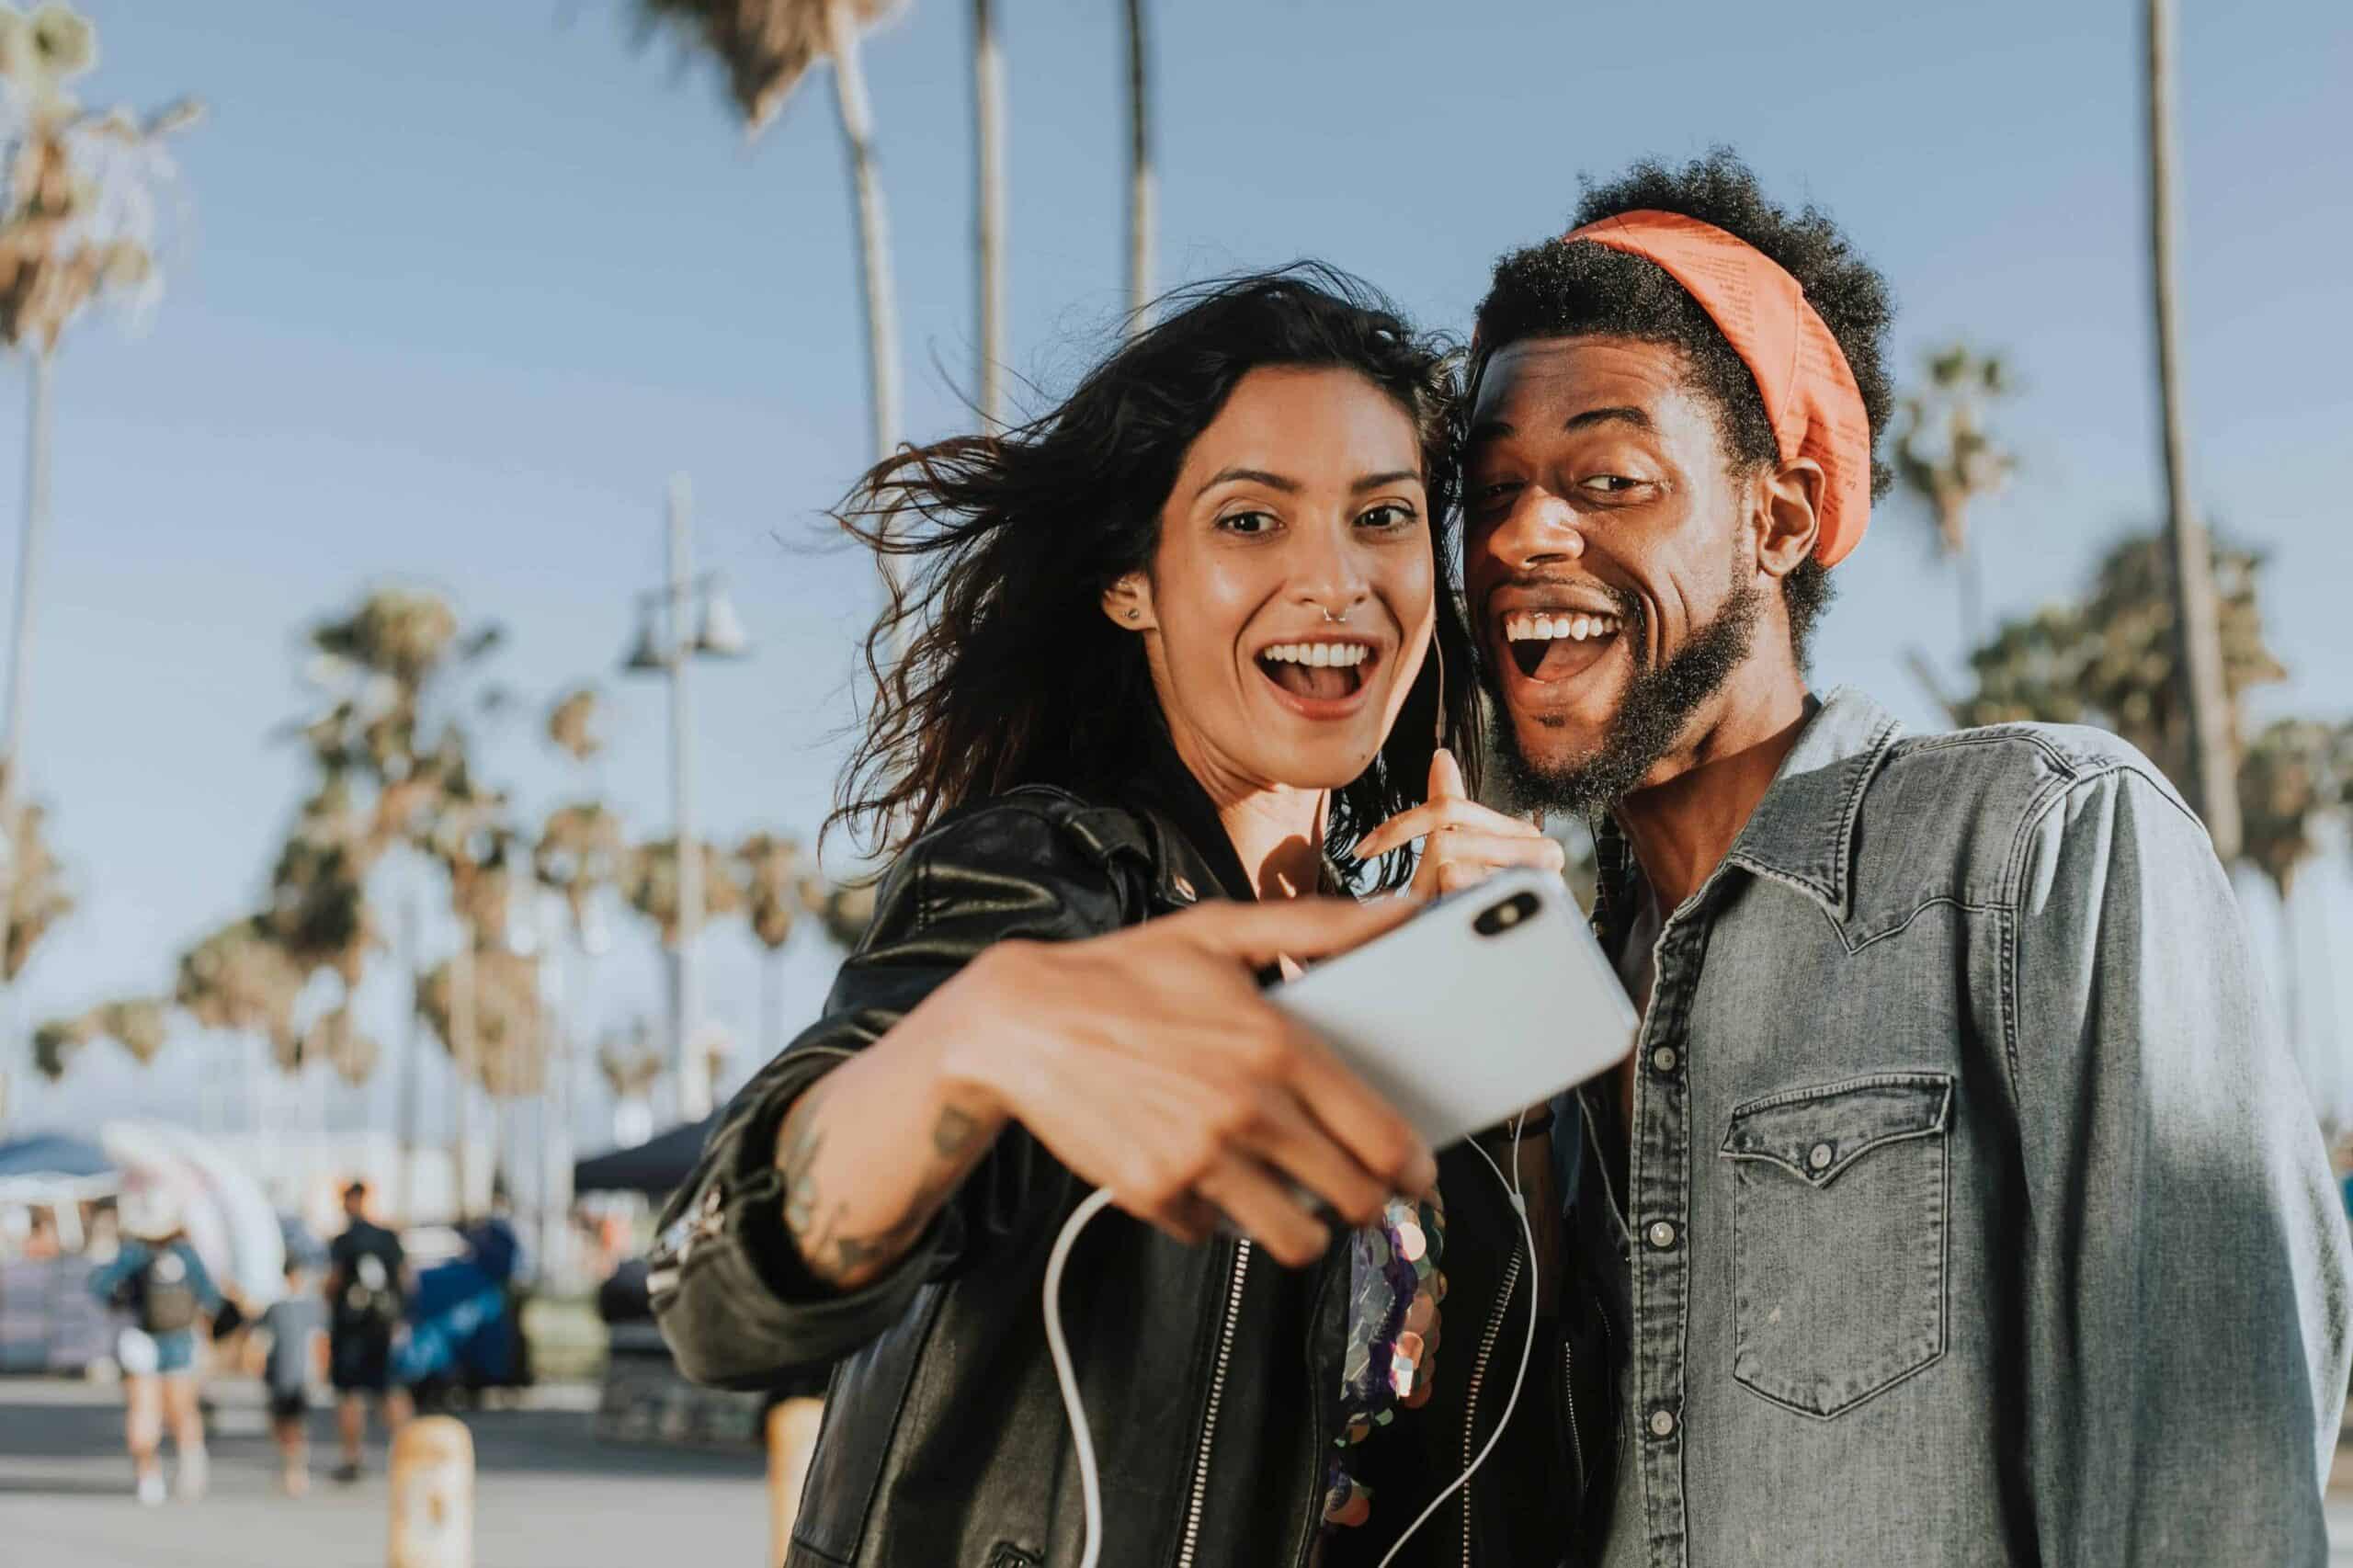 man-and-woman-taking-selfie